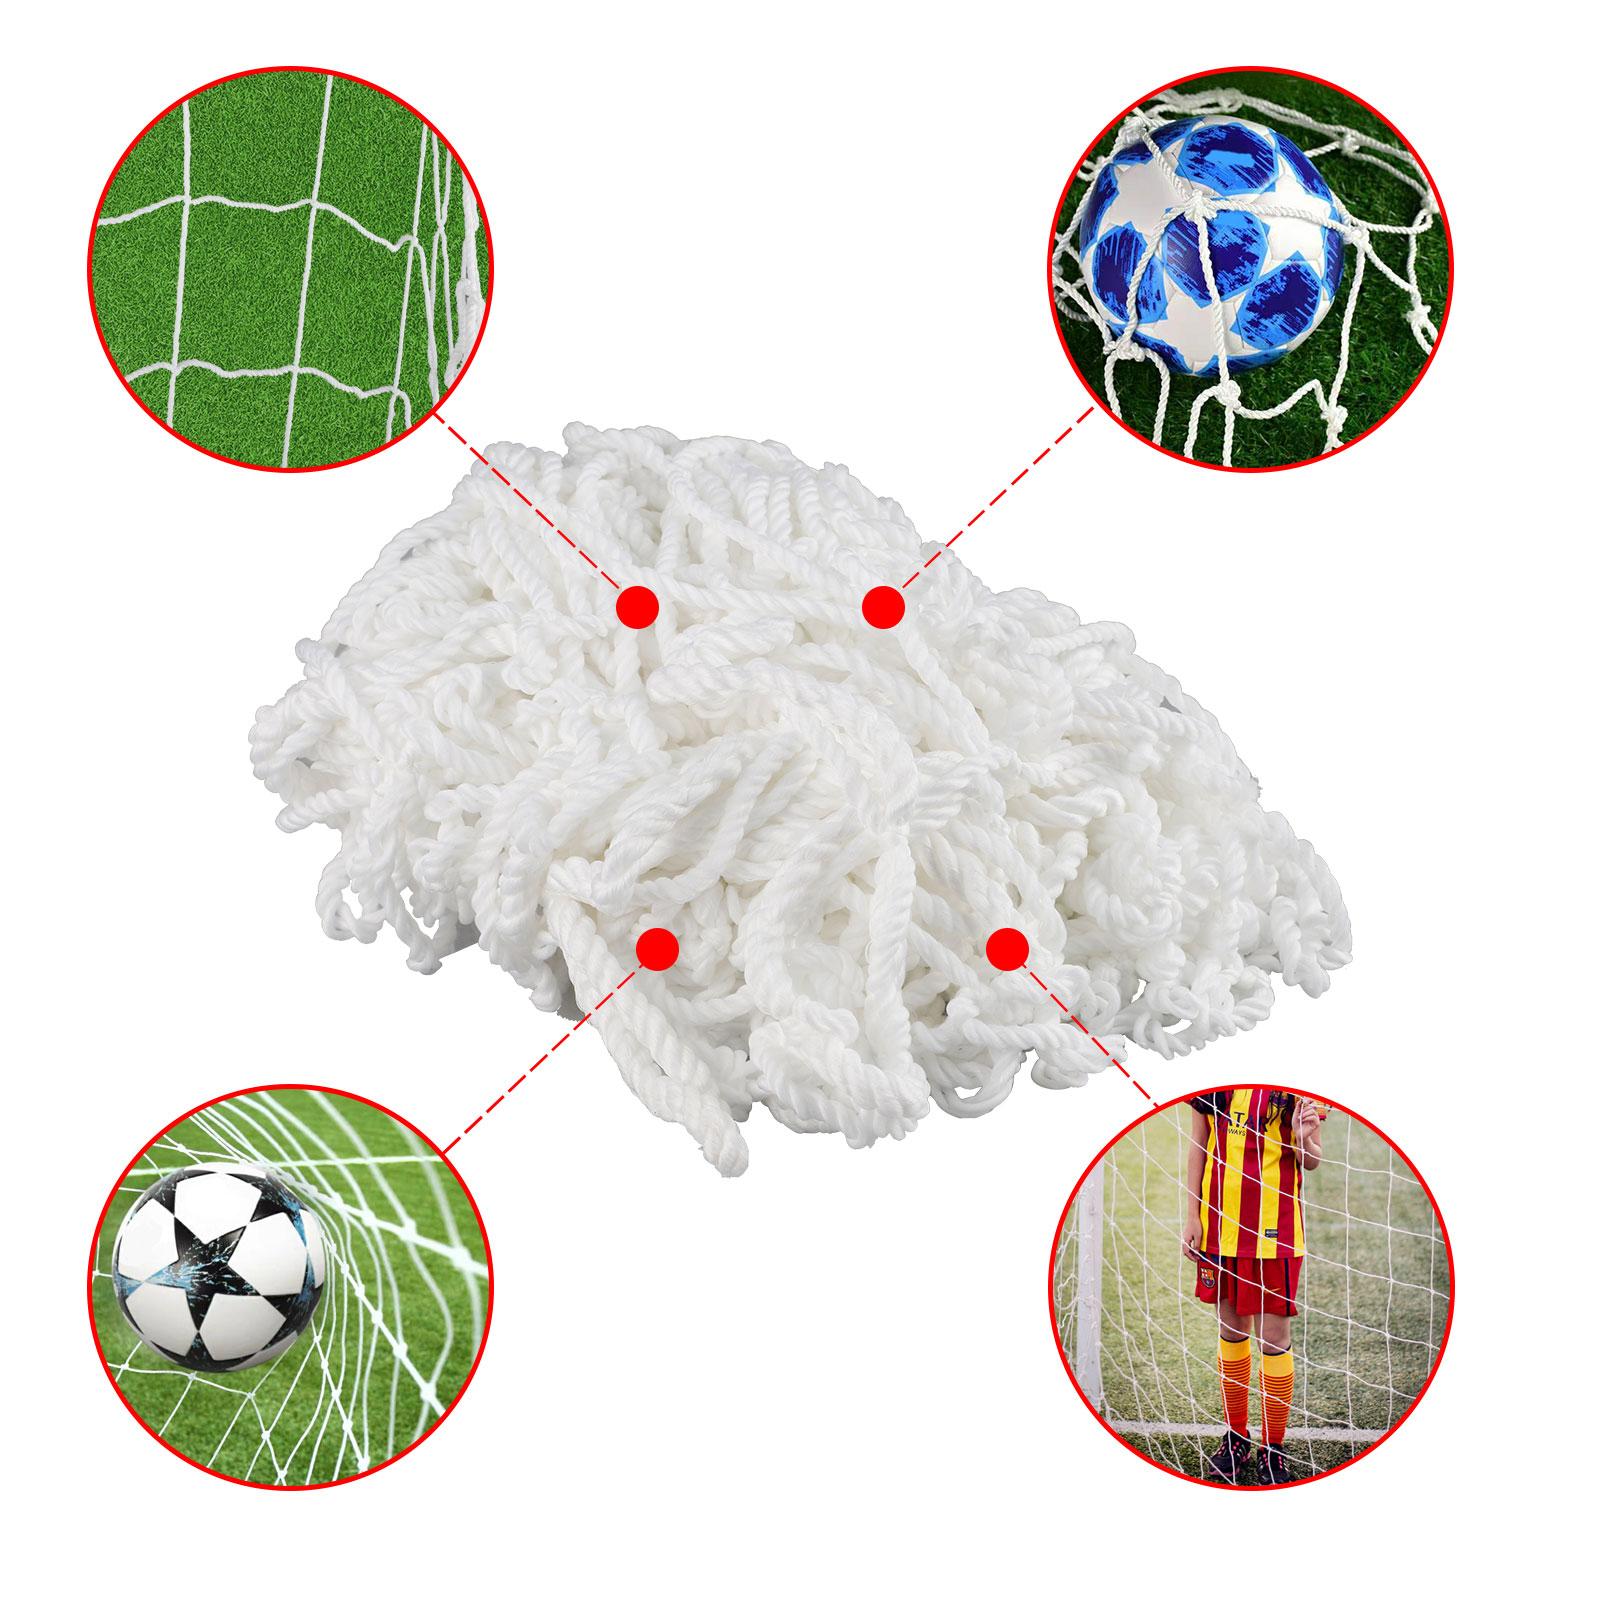 6-4ft-PE-Football-Soccer-Goal-Net-Outdoor-Backyard-Sport-Match-Training-for-Kids thumbnail 8